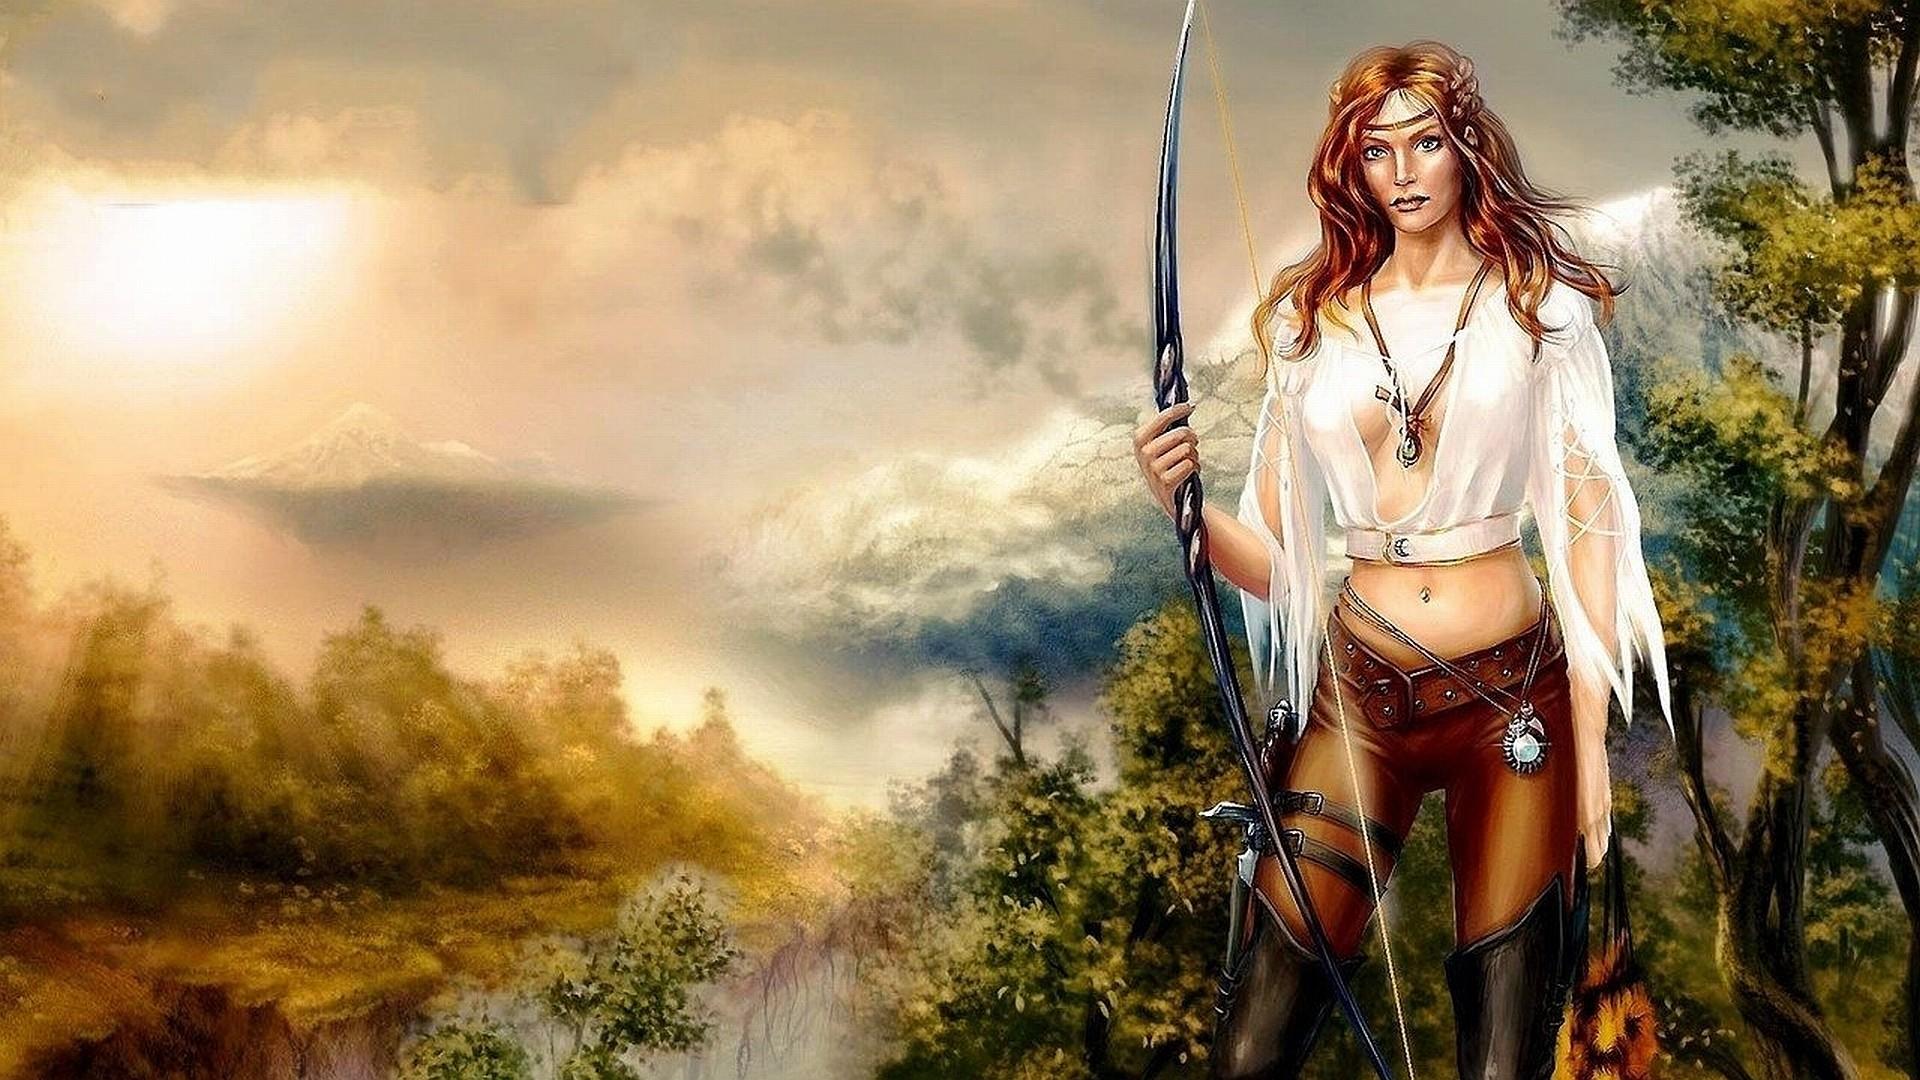 Fantasy women warriors wallpaper 84 images - Fantasy desktop pictures ...